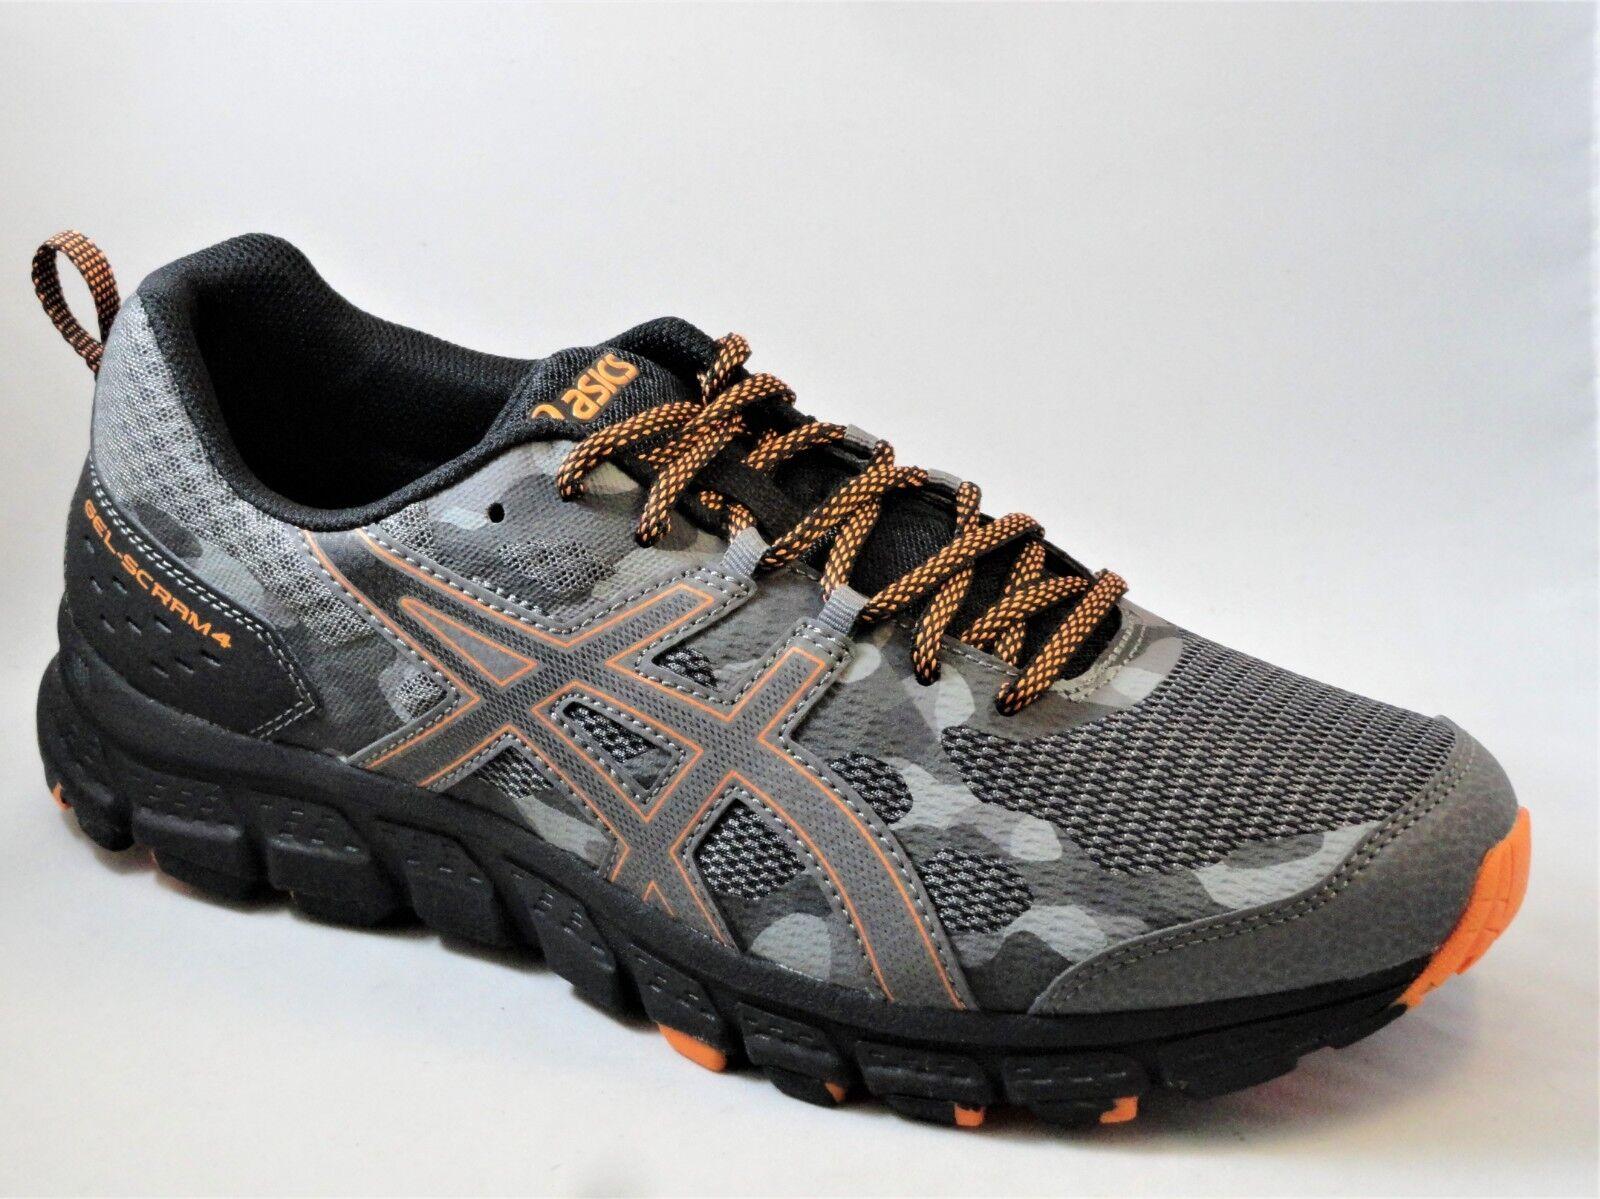 Men's Asics GEL-SCRAM 4 1011A045/020 Carbon Lava Trail Running Shoes